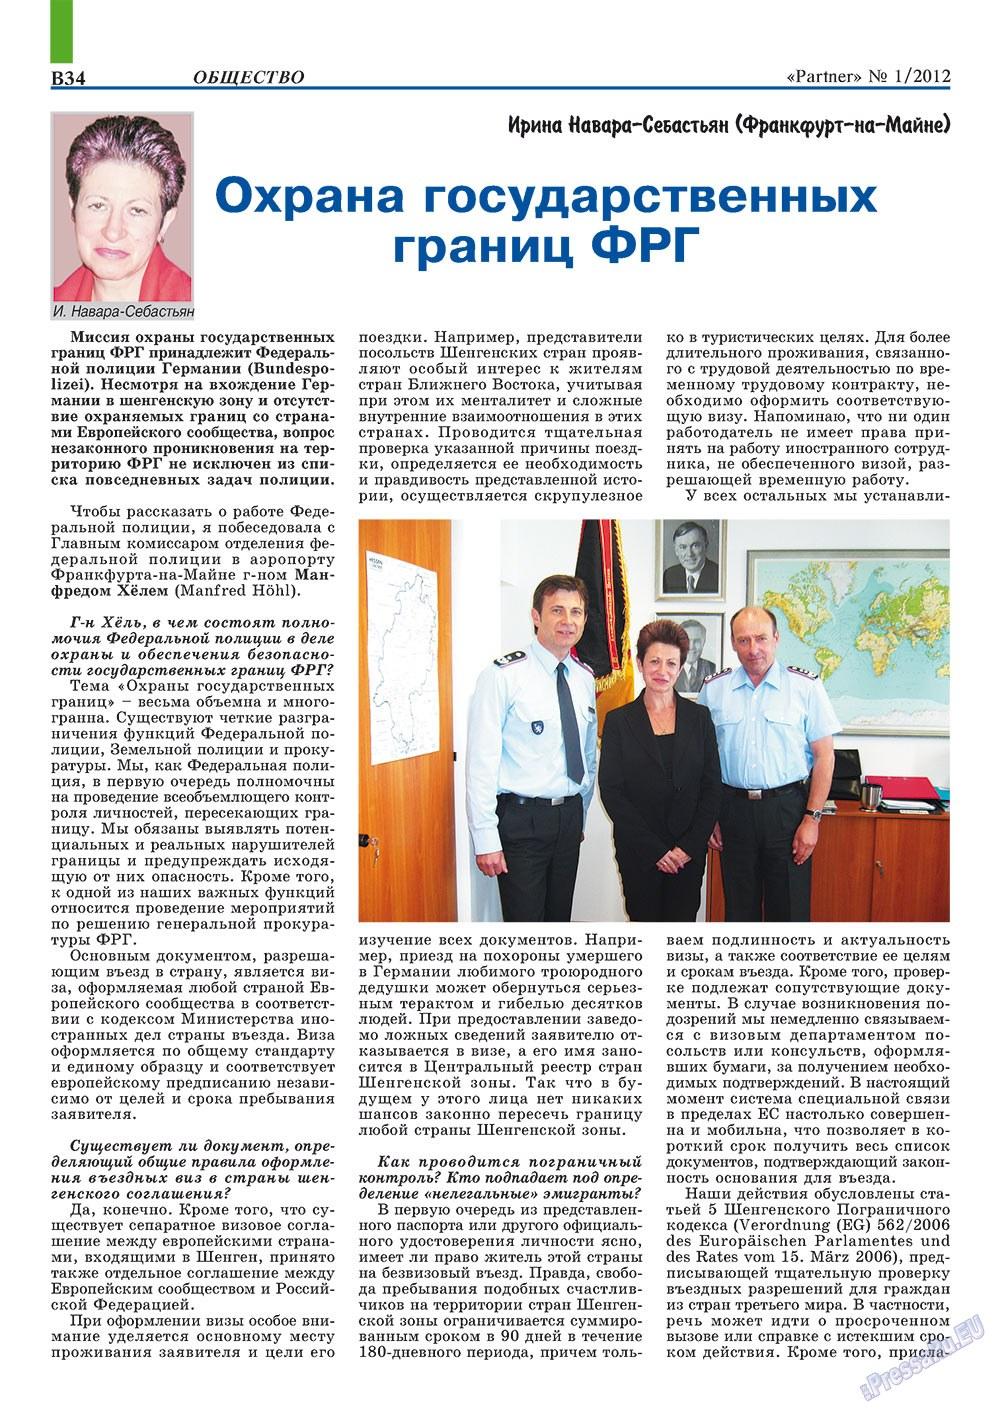 Партнер-север (журнал). 2012 год, номер 1, стр. 44